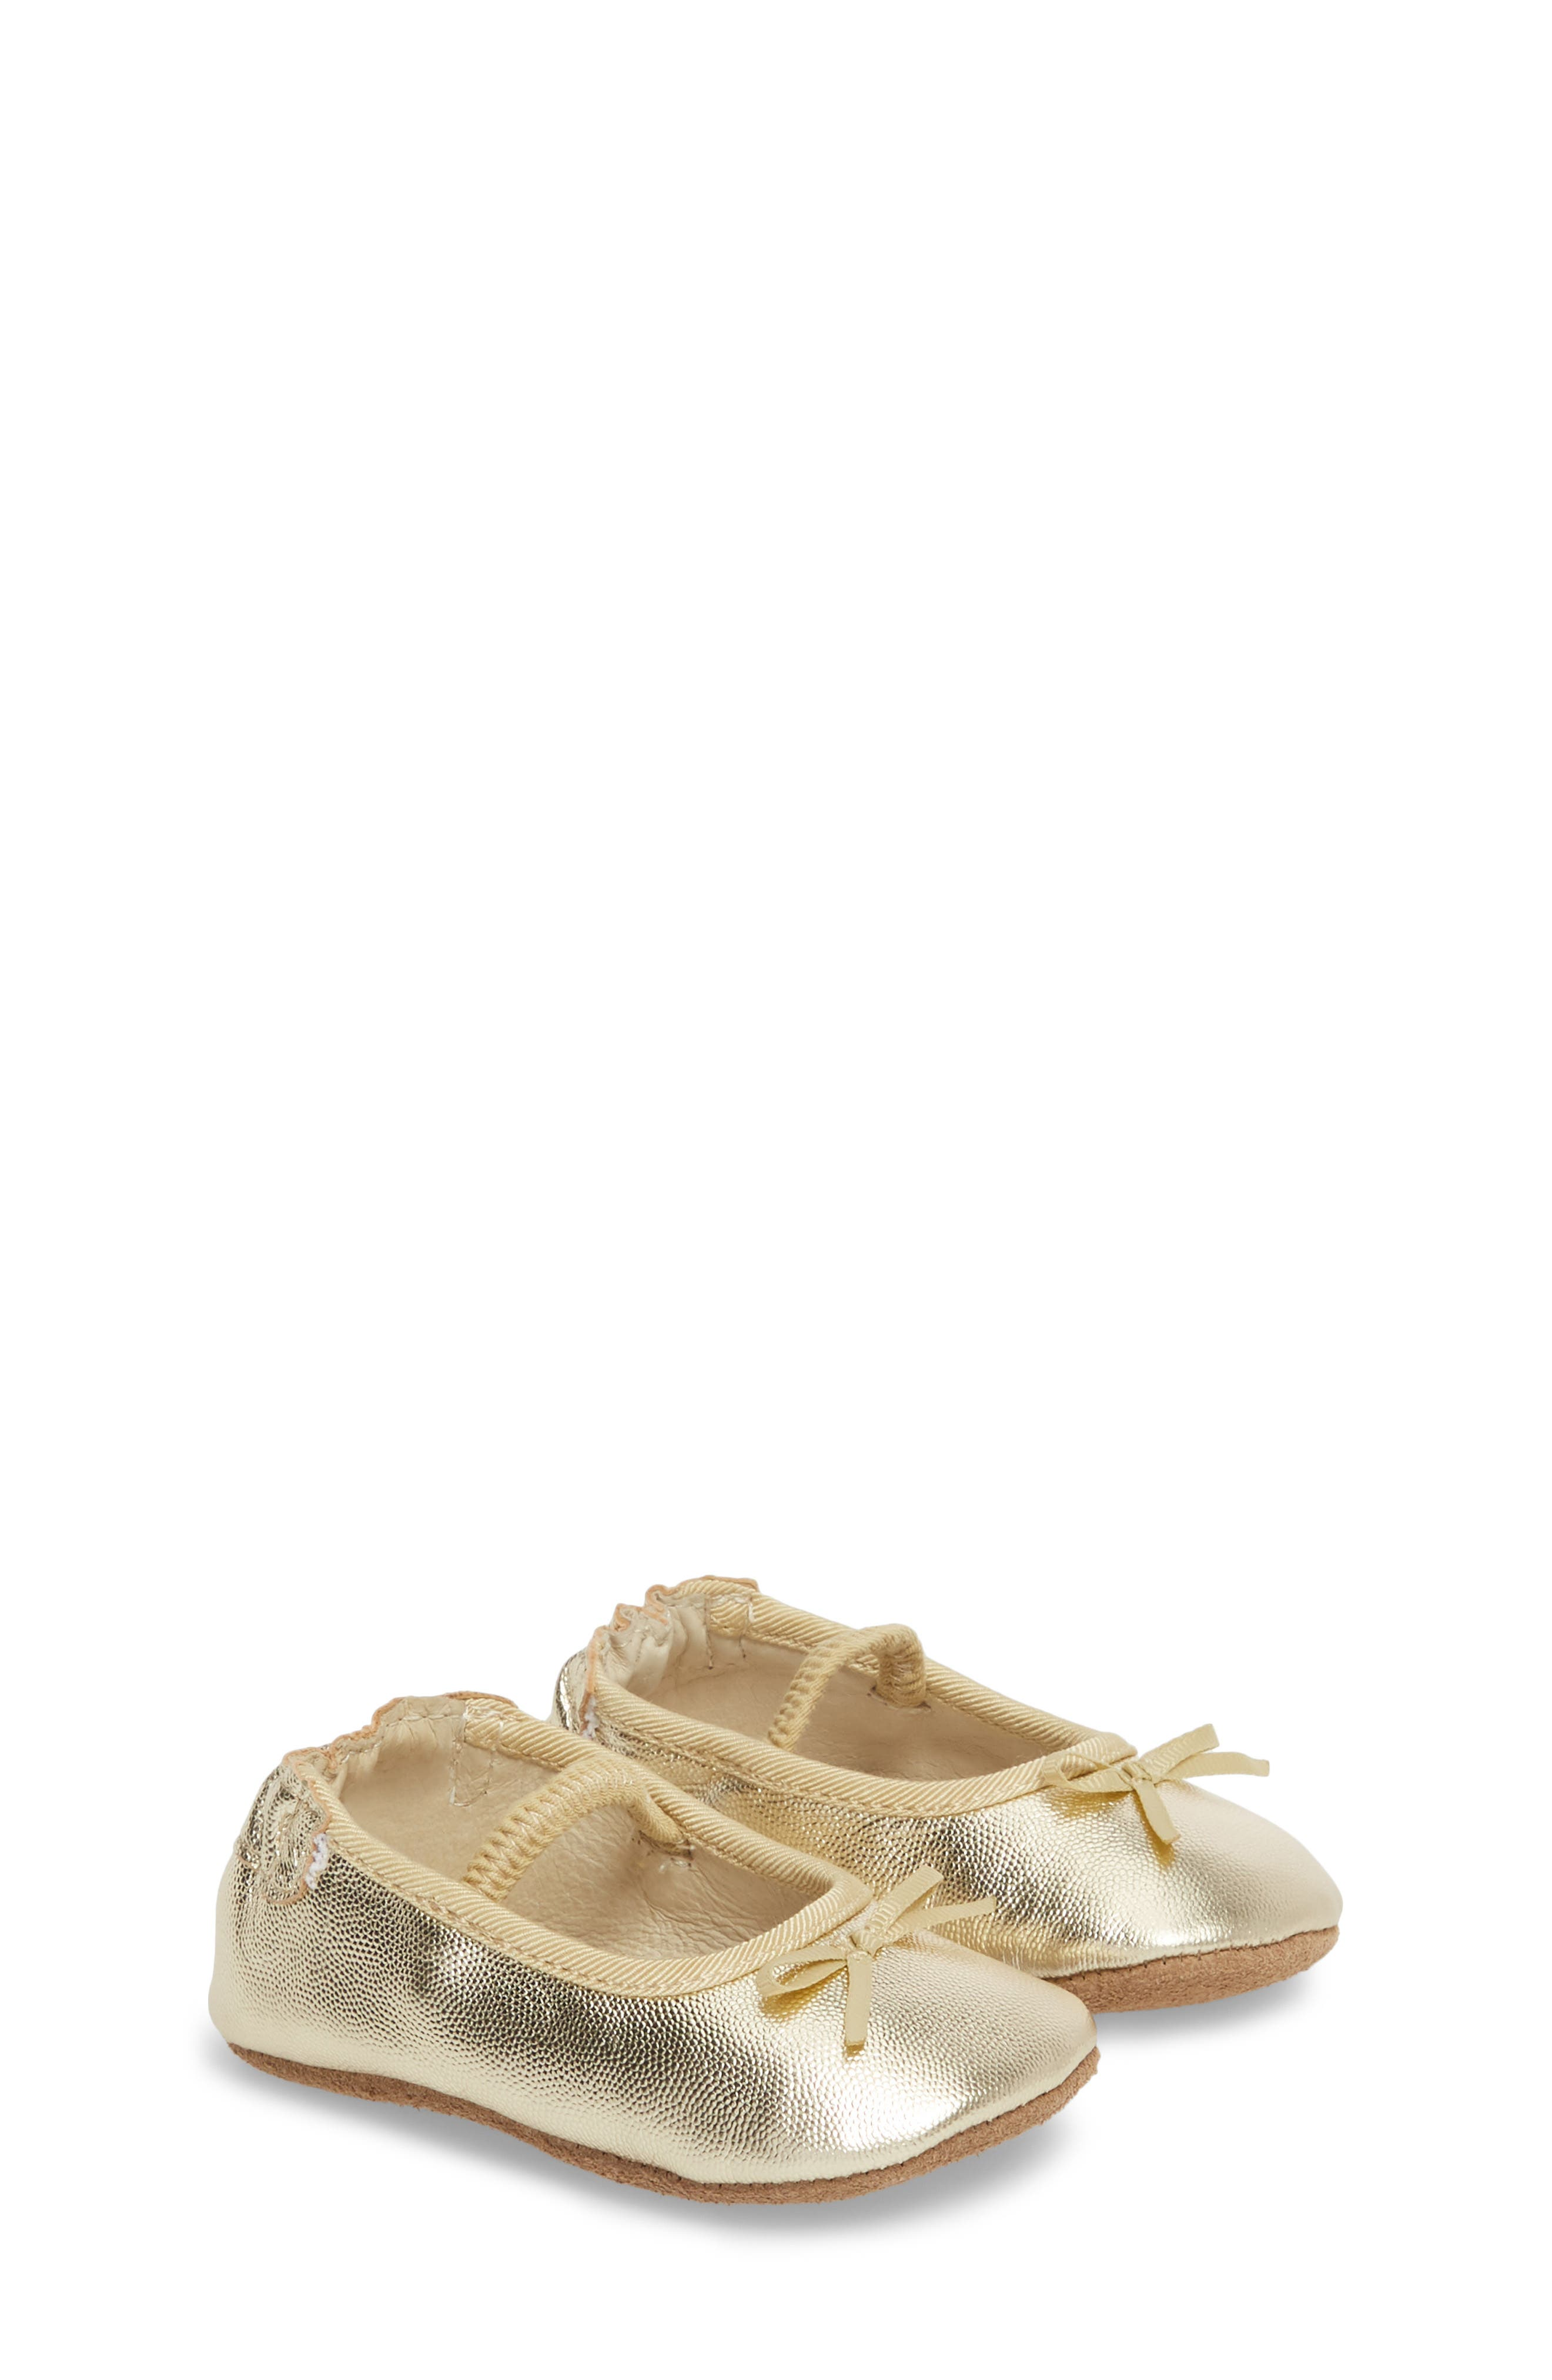 Athena Ballet Strap Crib Shoe,                         Main,                         color, GOLD